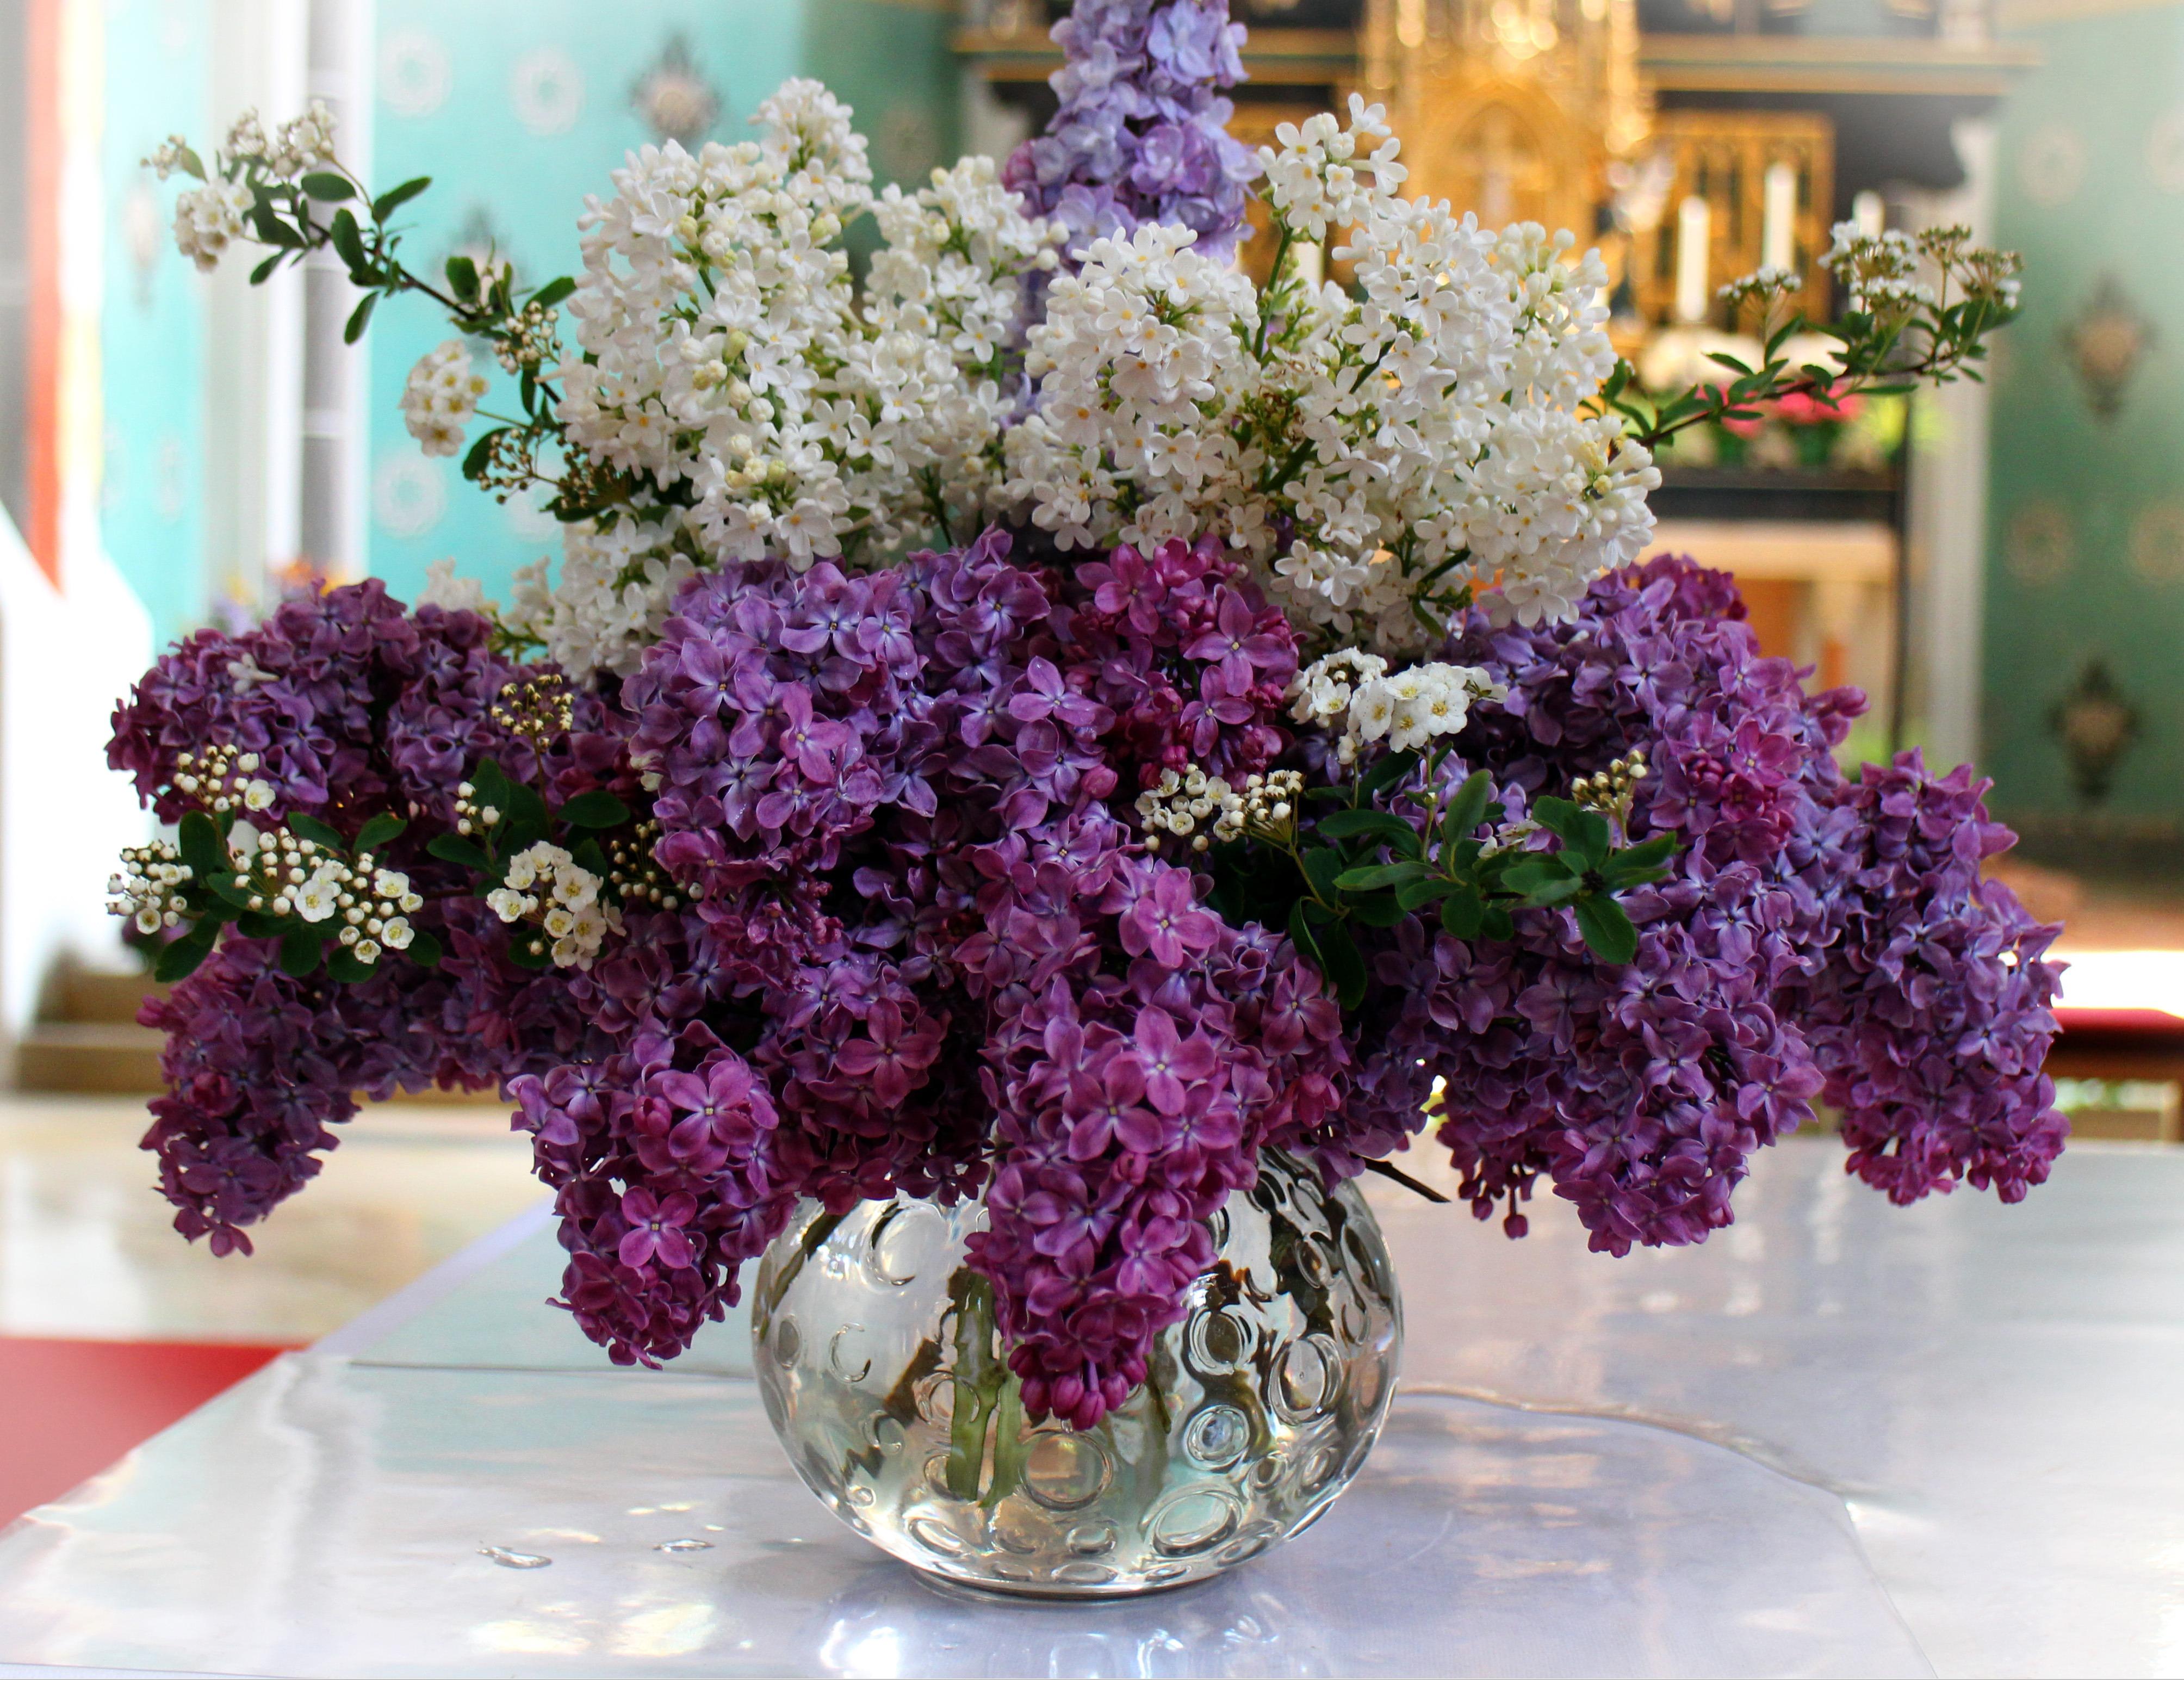 Free Images : blossom, white, purple, bloom, floristry, ornamental ...